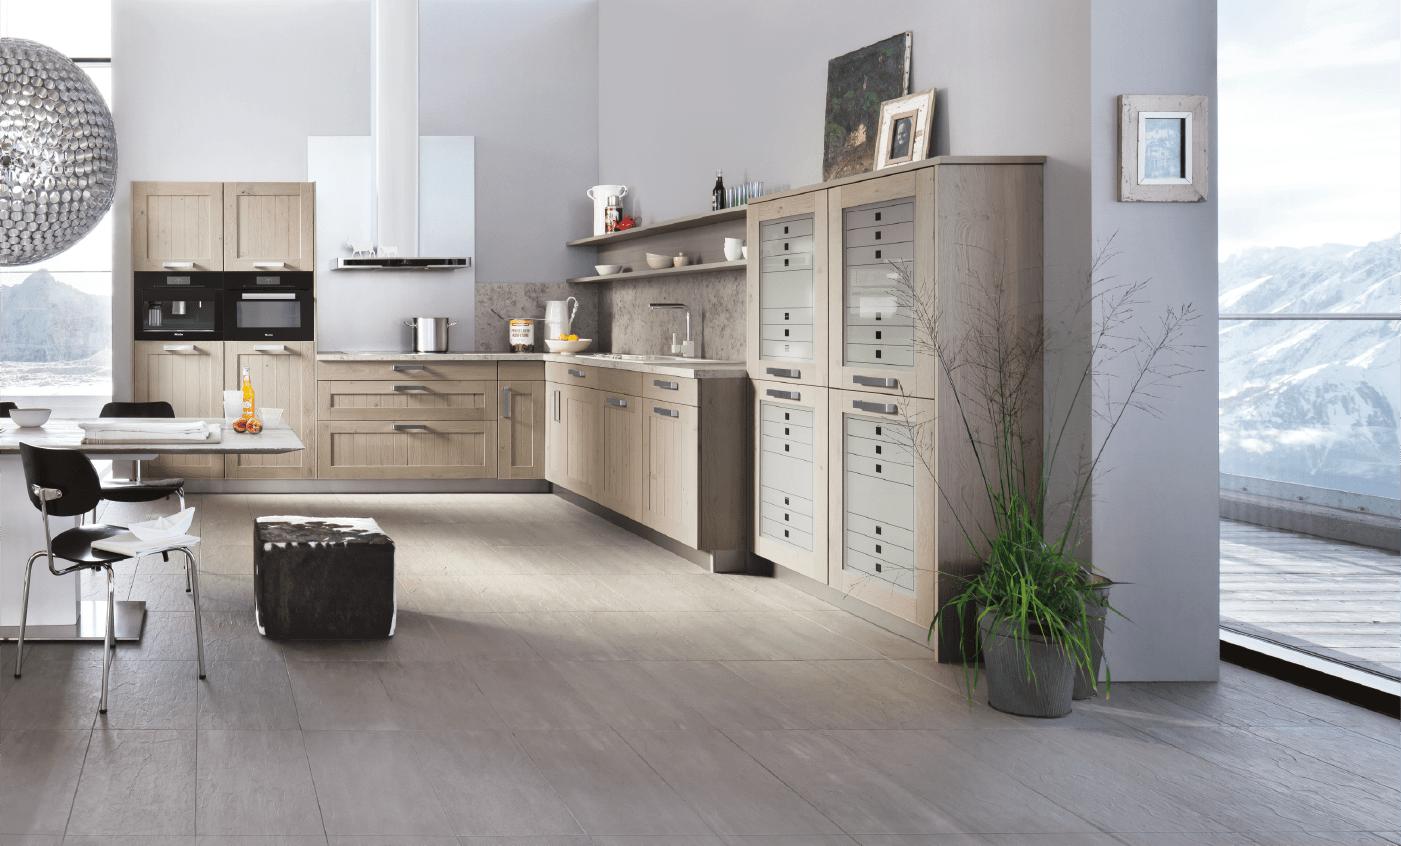 Cabeo-keukens-1-keuken-foto-1